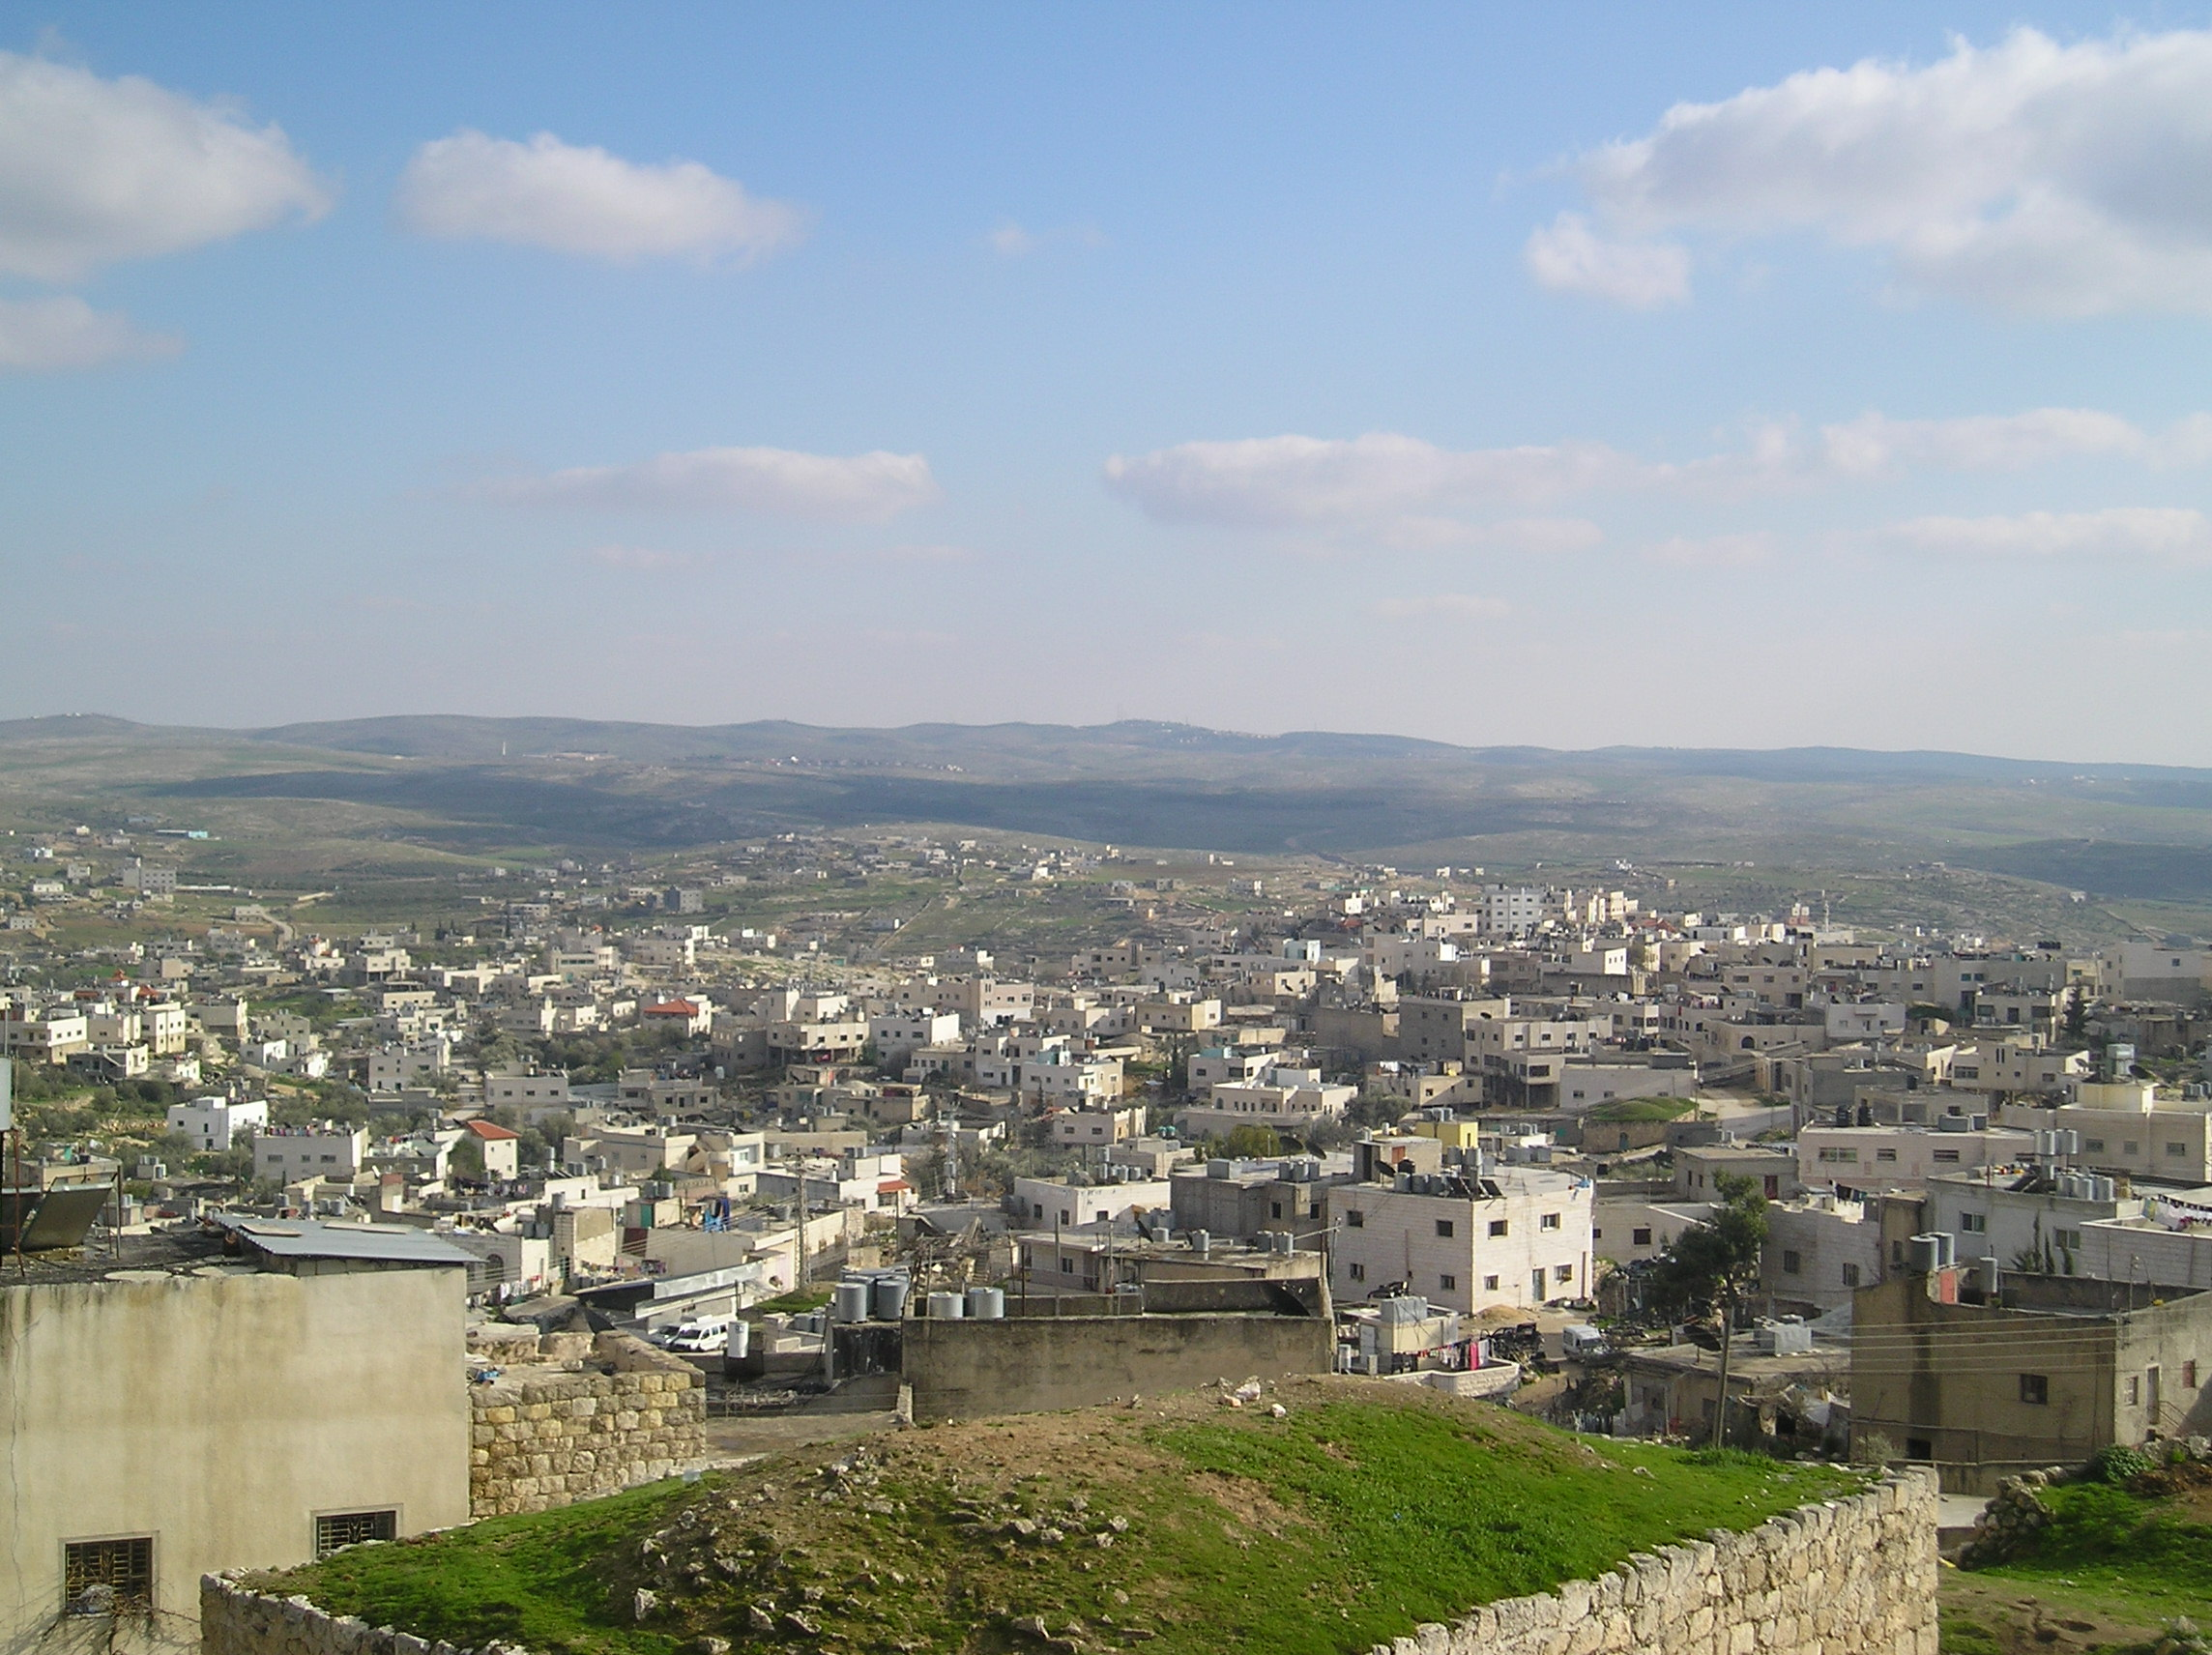 Yatta-يطّا: يطا ومنظر عام للبلده ويظهر على السفح الجبل مستوطنه سوسيا